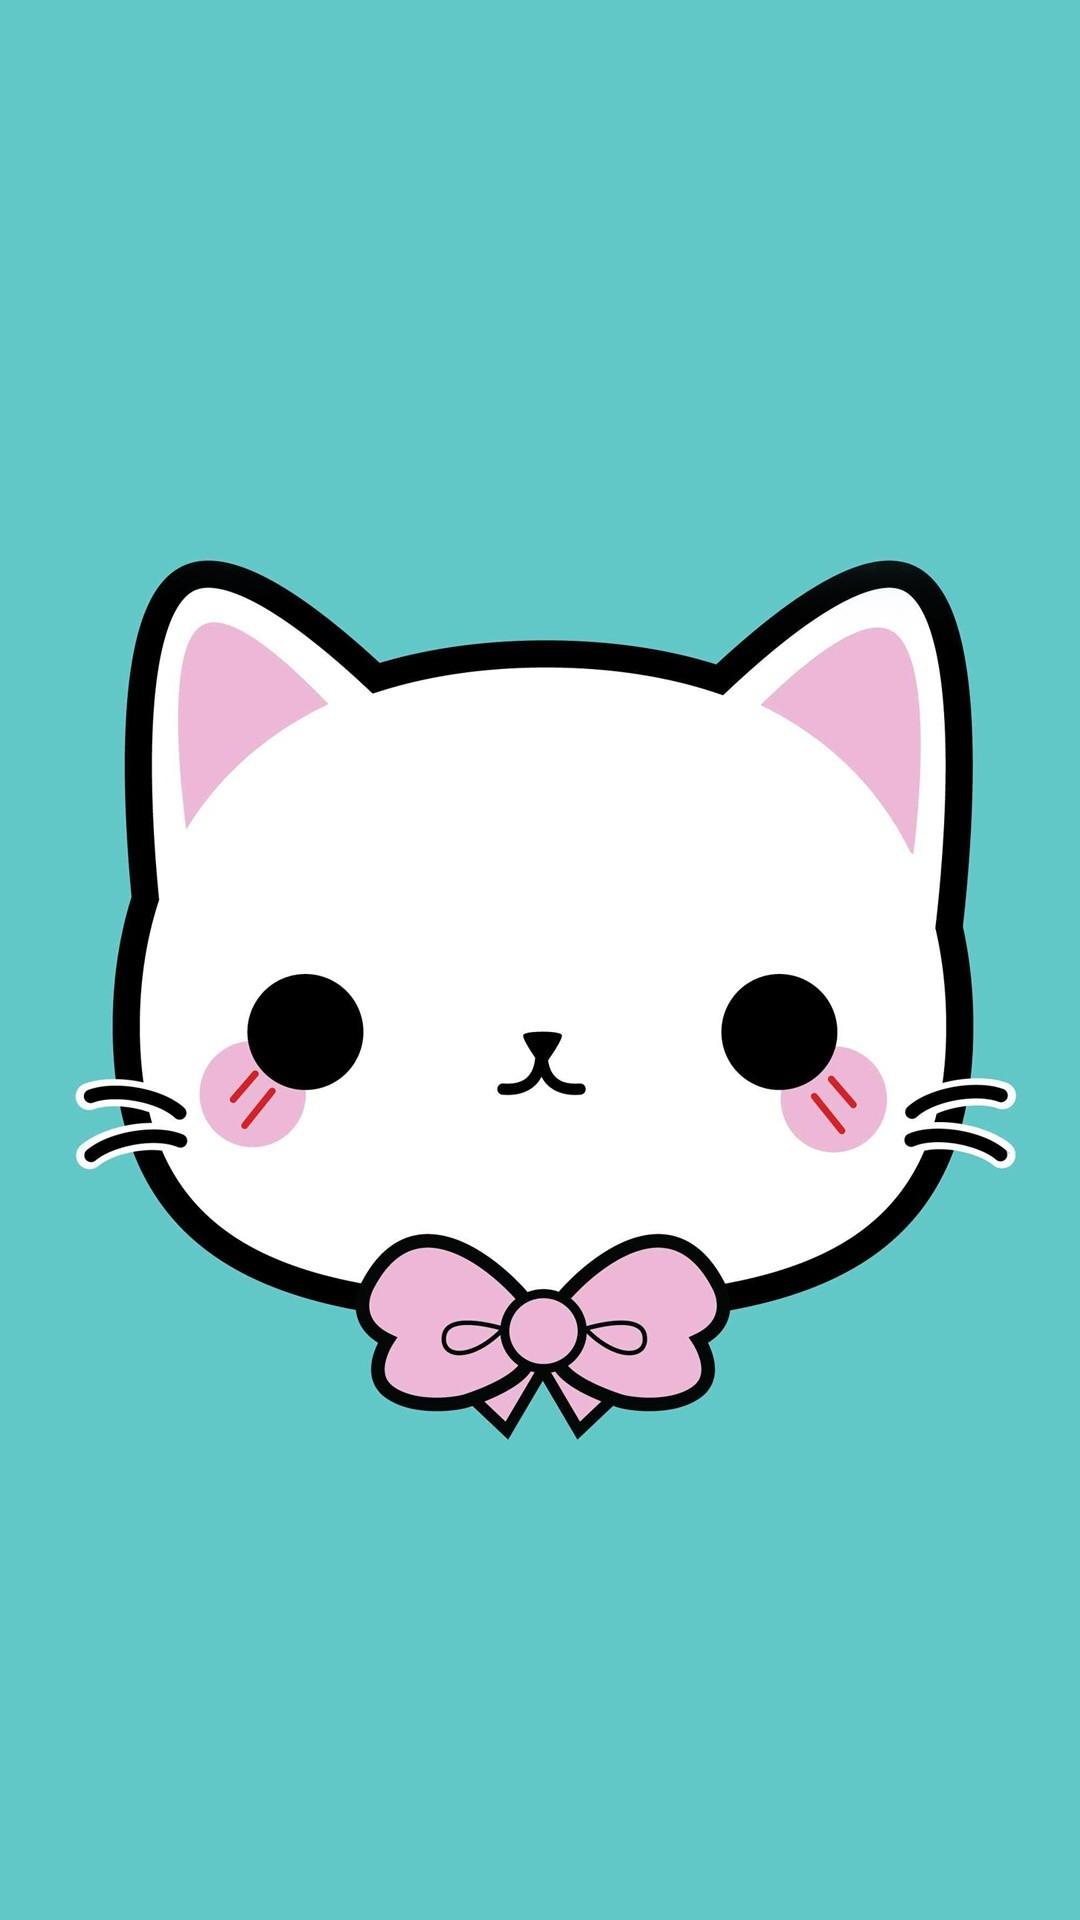 Pusheen Iphone Wallpaper Cute Cute Kawaii Wallpapers 74 Images